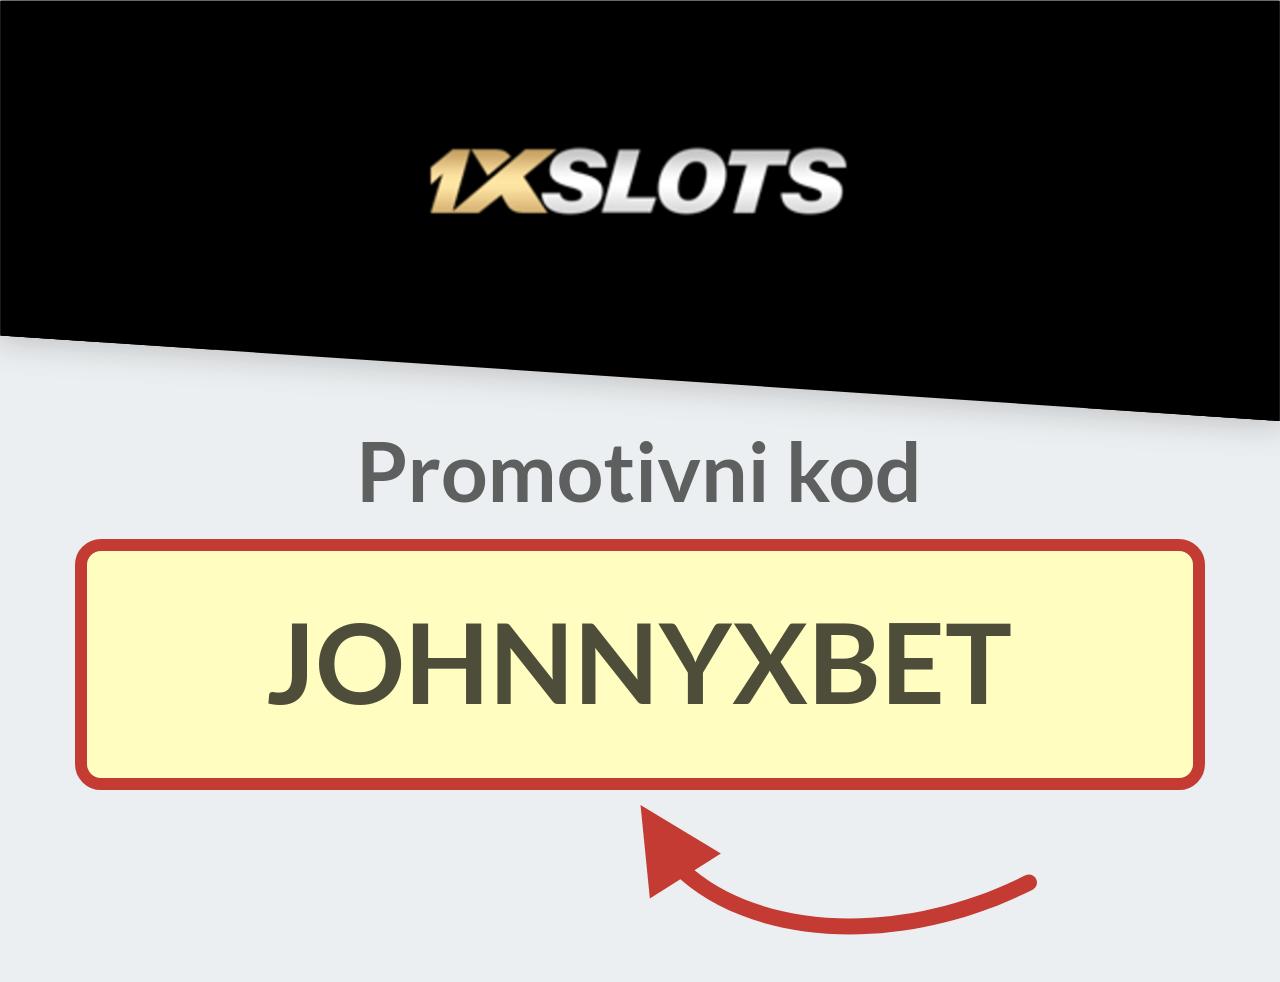 1XSLOTS Promotivni Kod